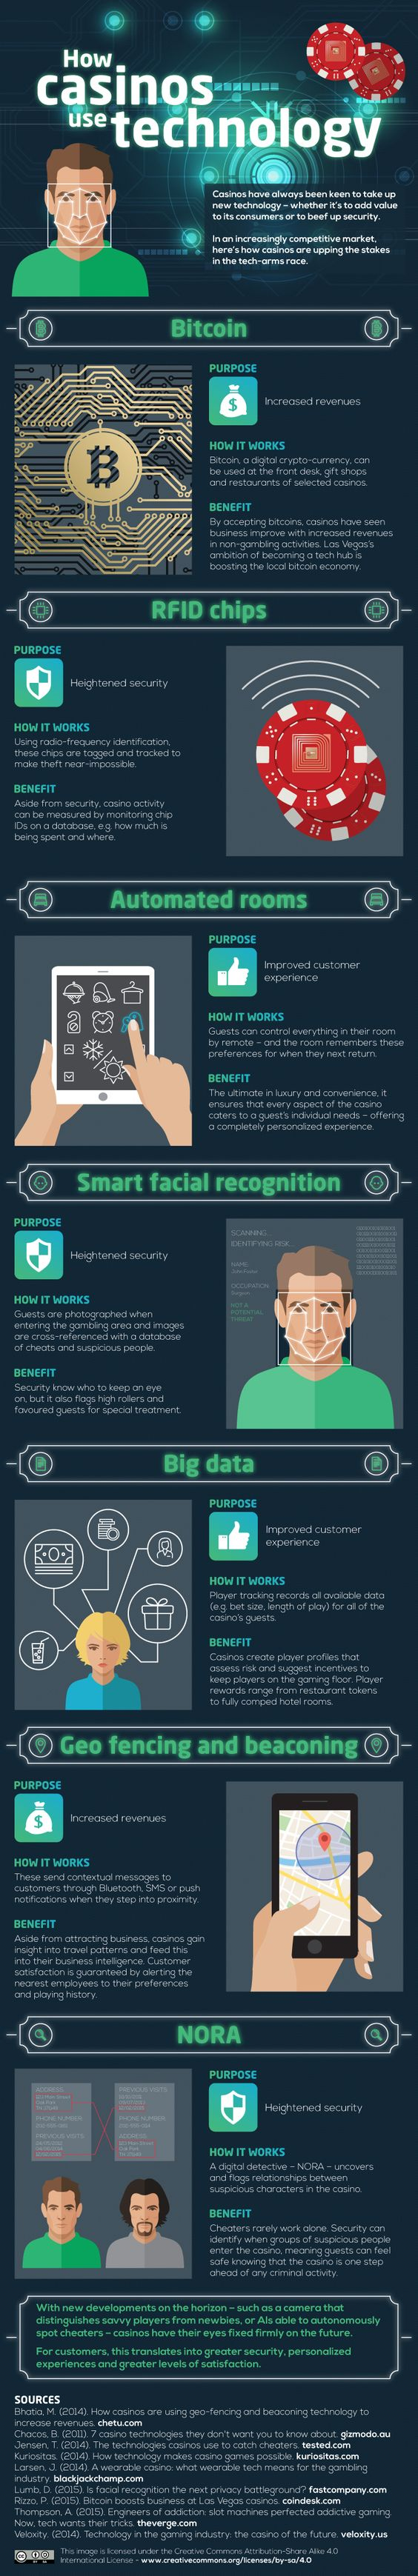 Casino Technology infographic